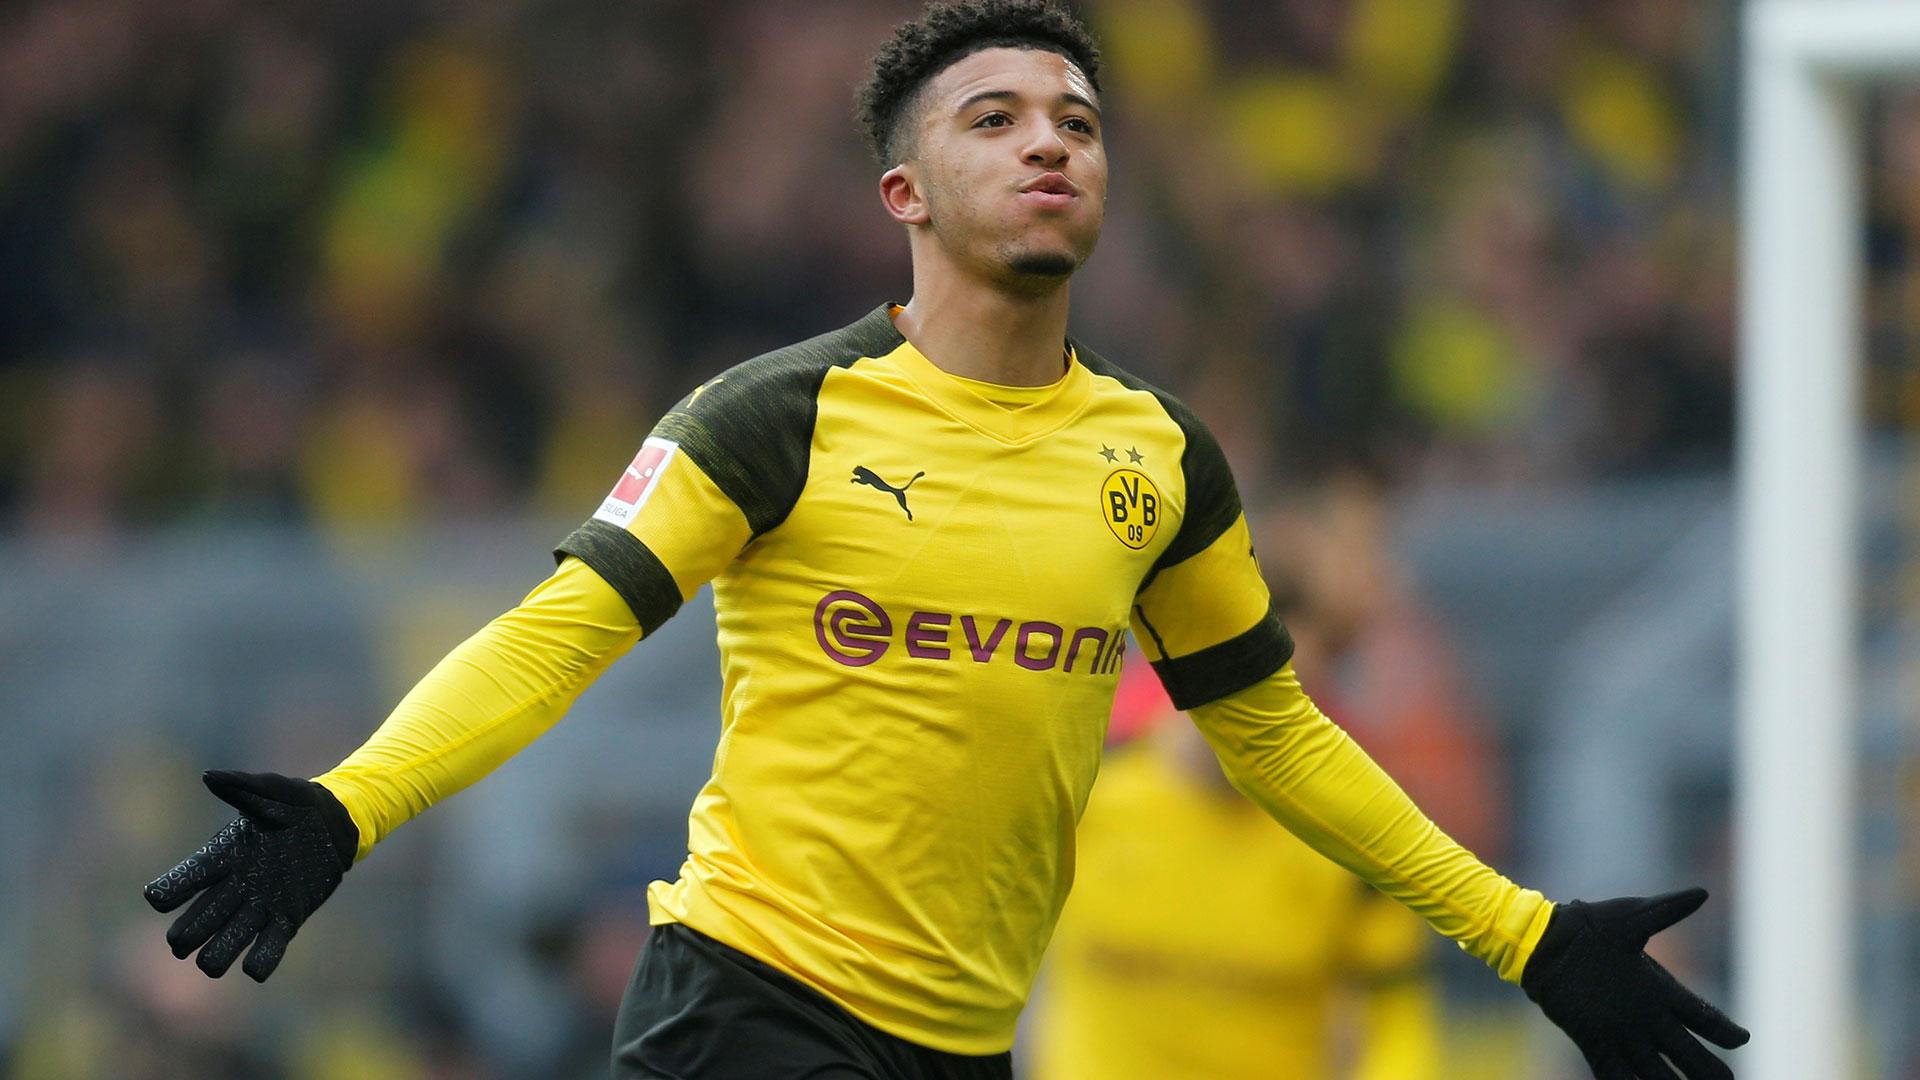 El inglés Jadon Sancho (Borussia Dortmund) USD 212 millones